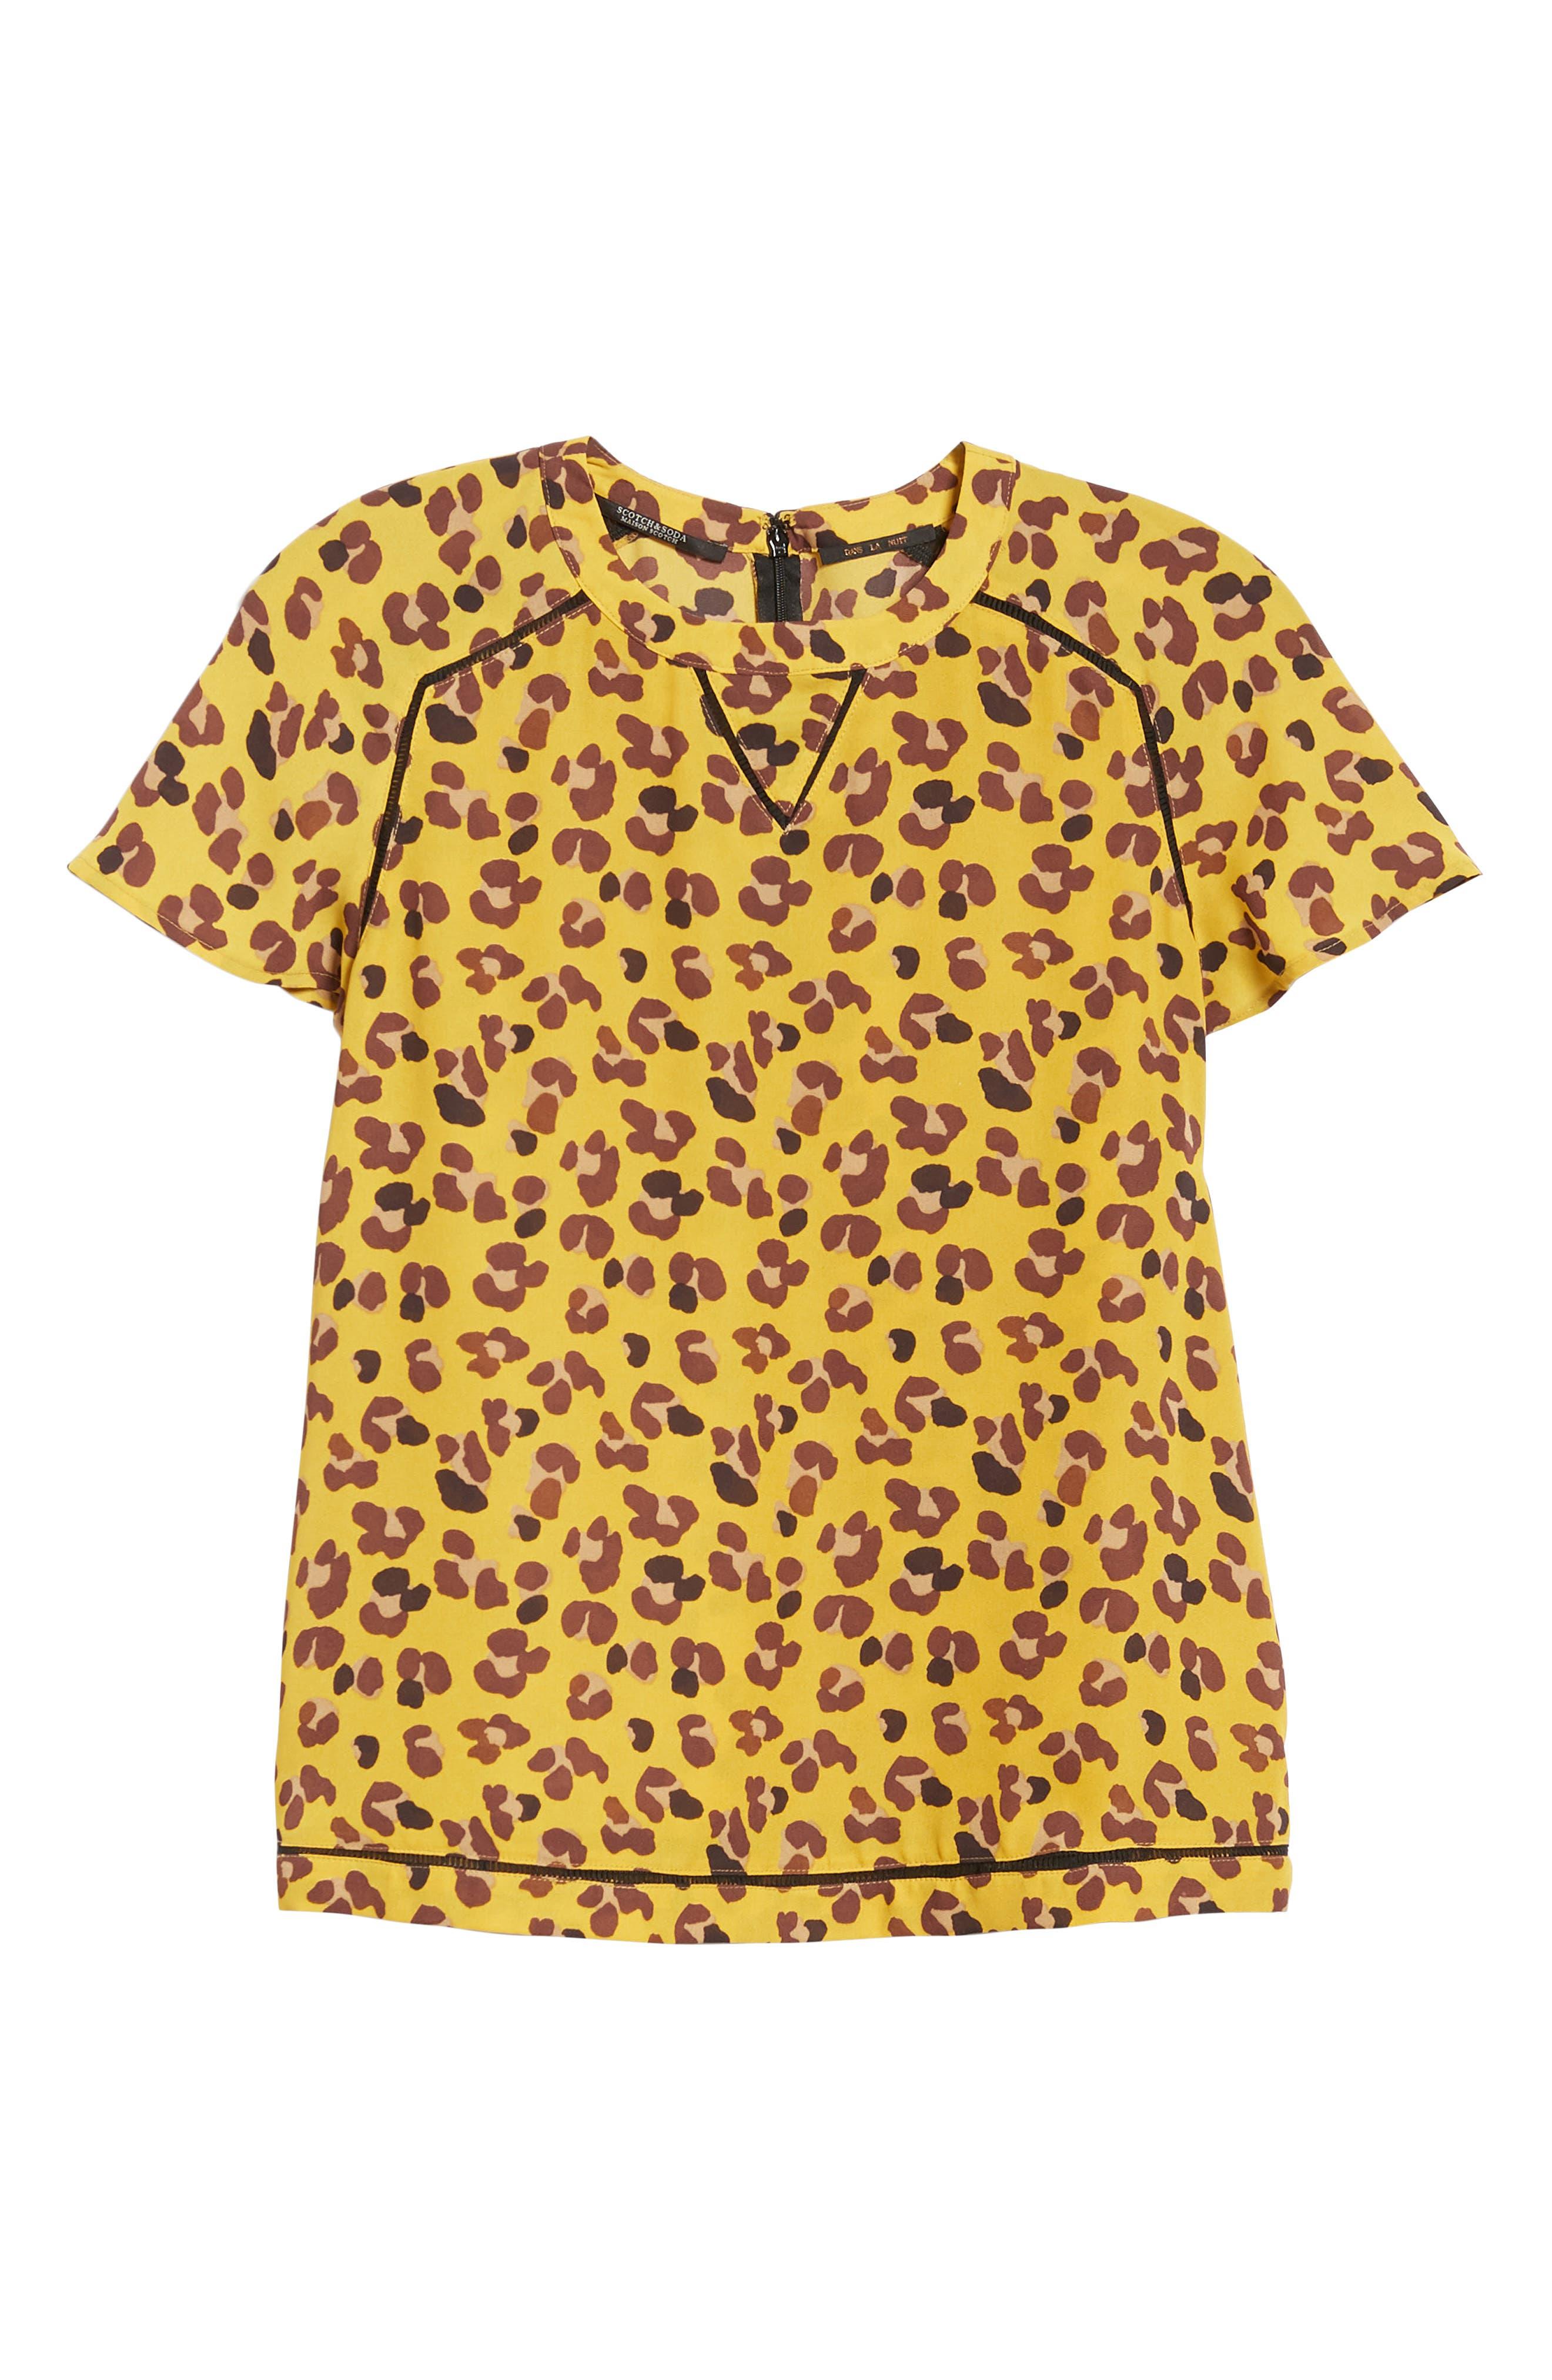 Leopard Print Top,                             Alternate thumbnail 6, color,                             YELLOW LEOPARD PRINT